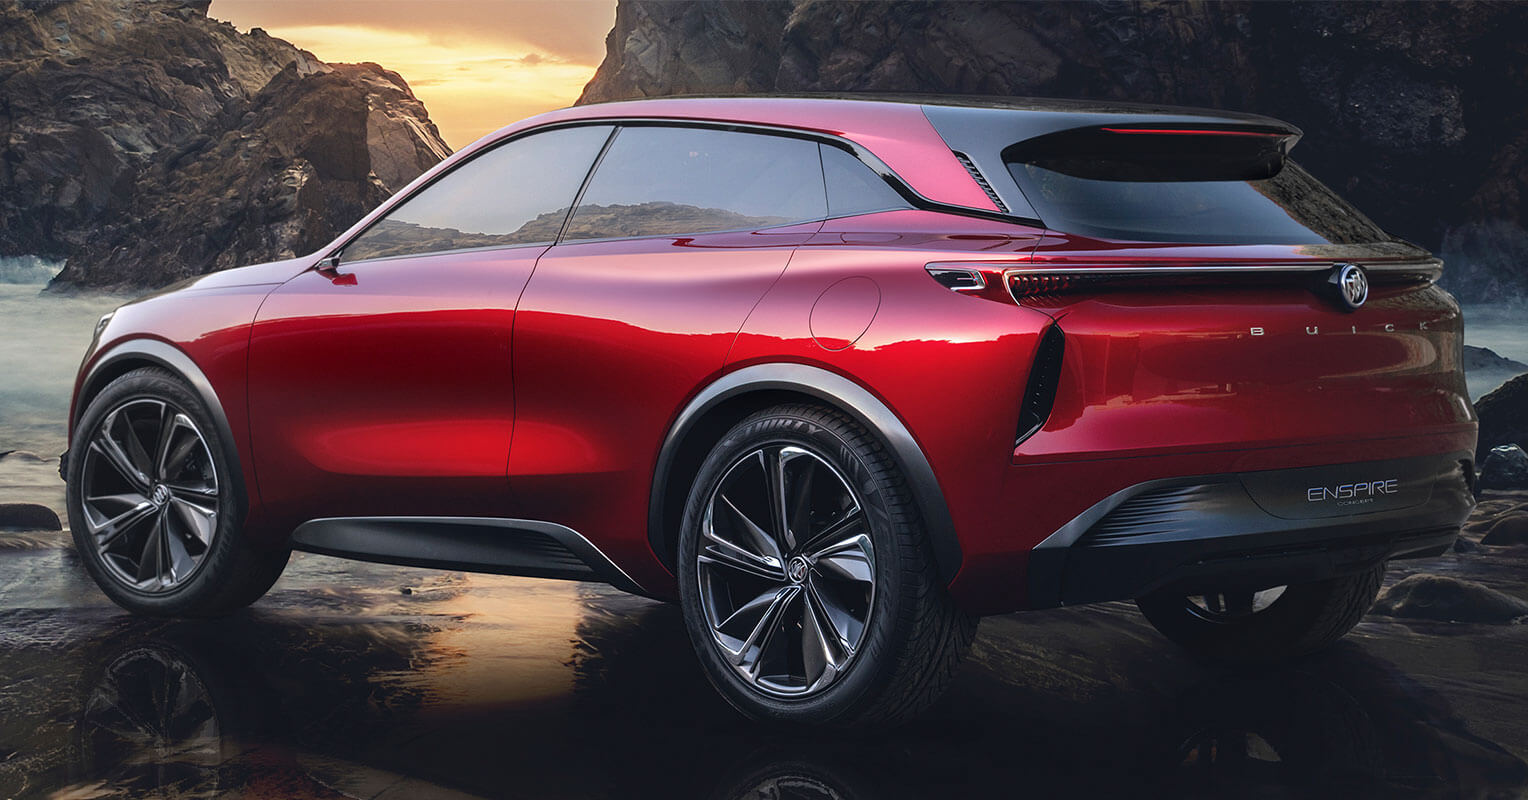 Buick Enspire concept trasera